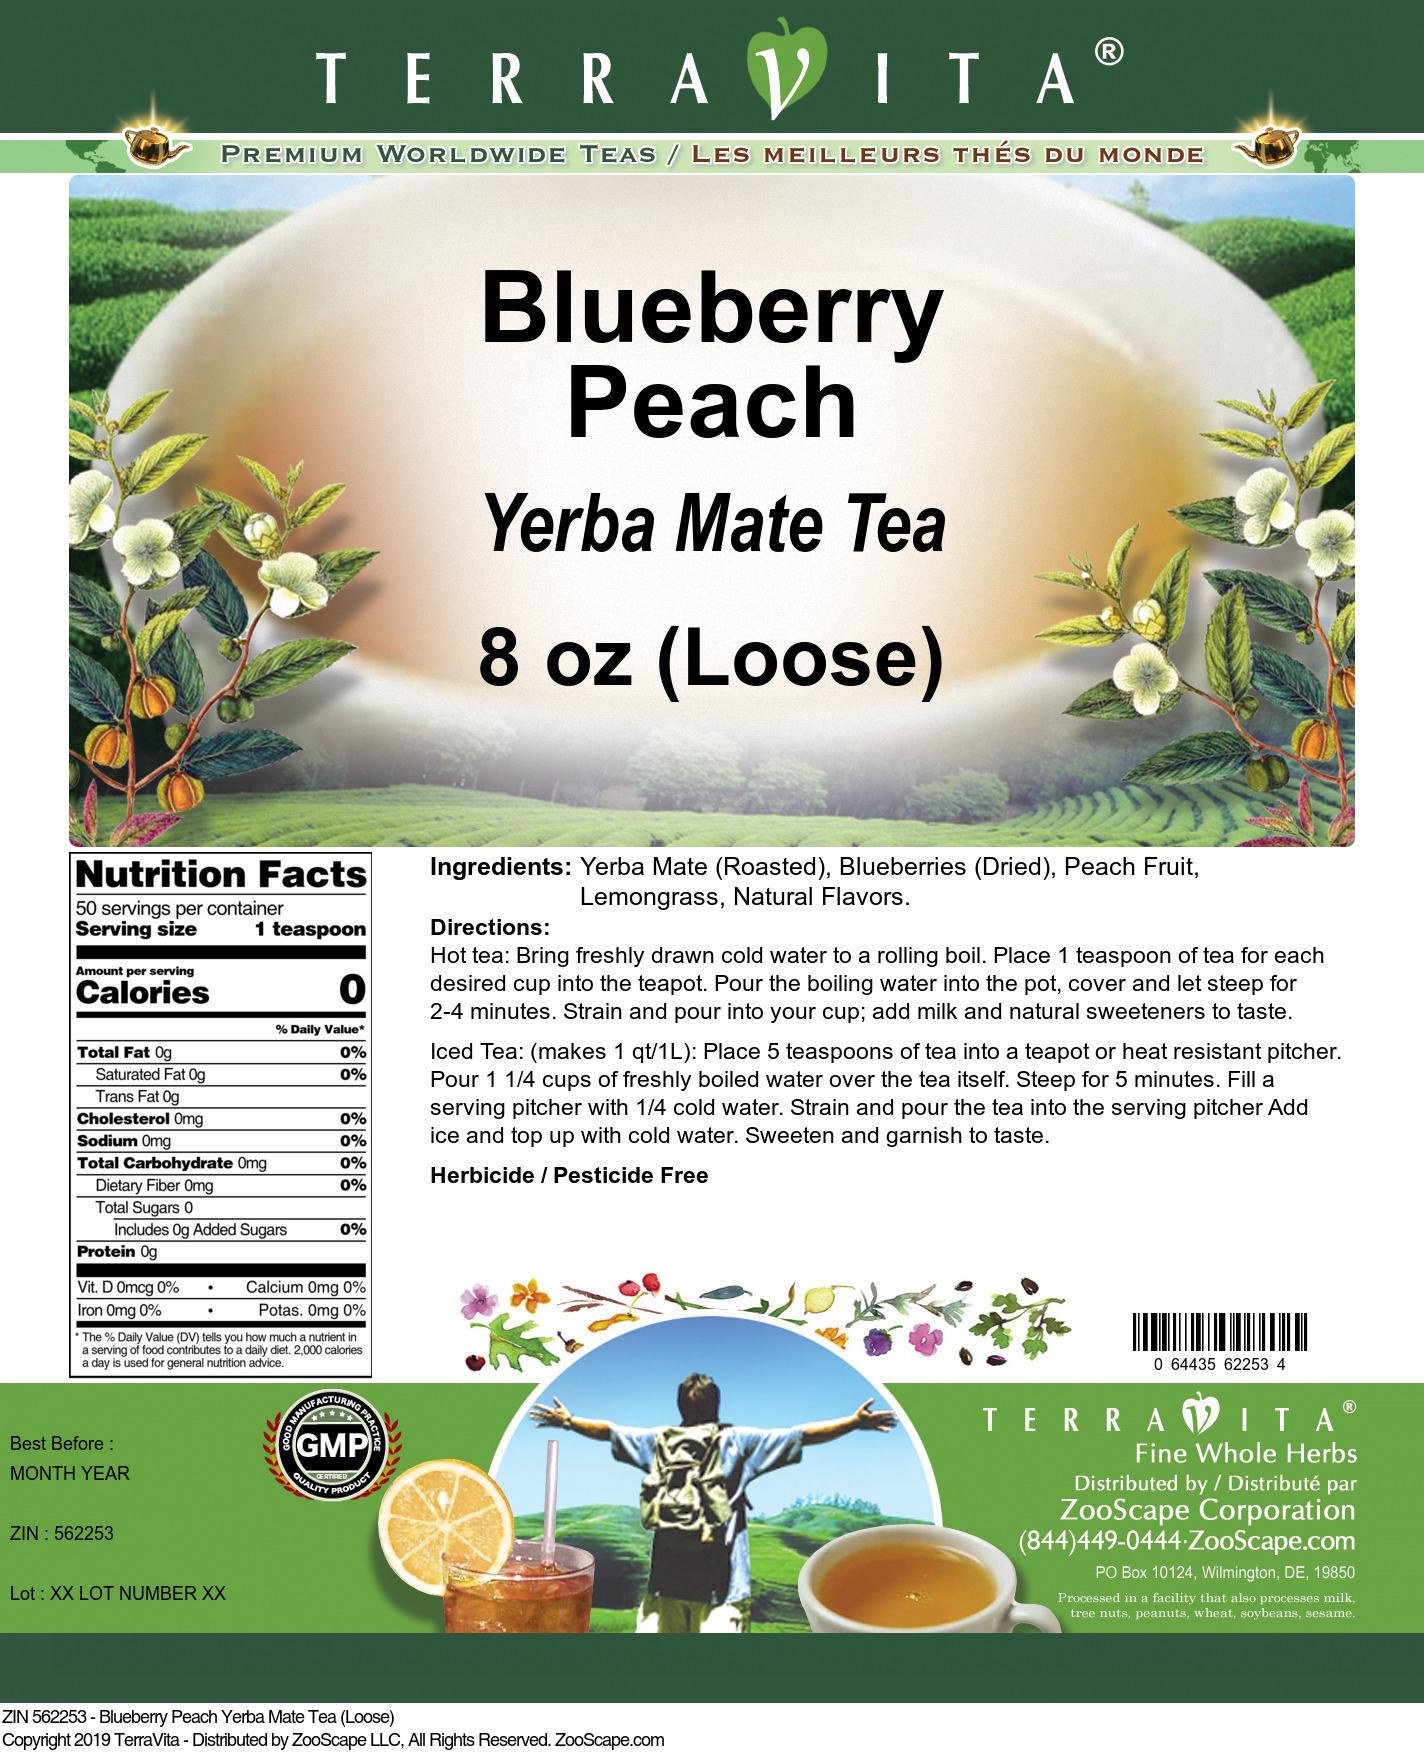 Blueberry Peach Yerba Mate Tea (Loose)